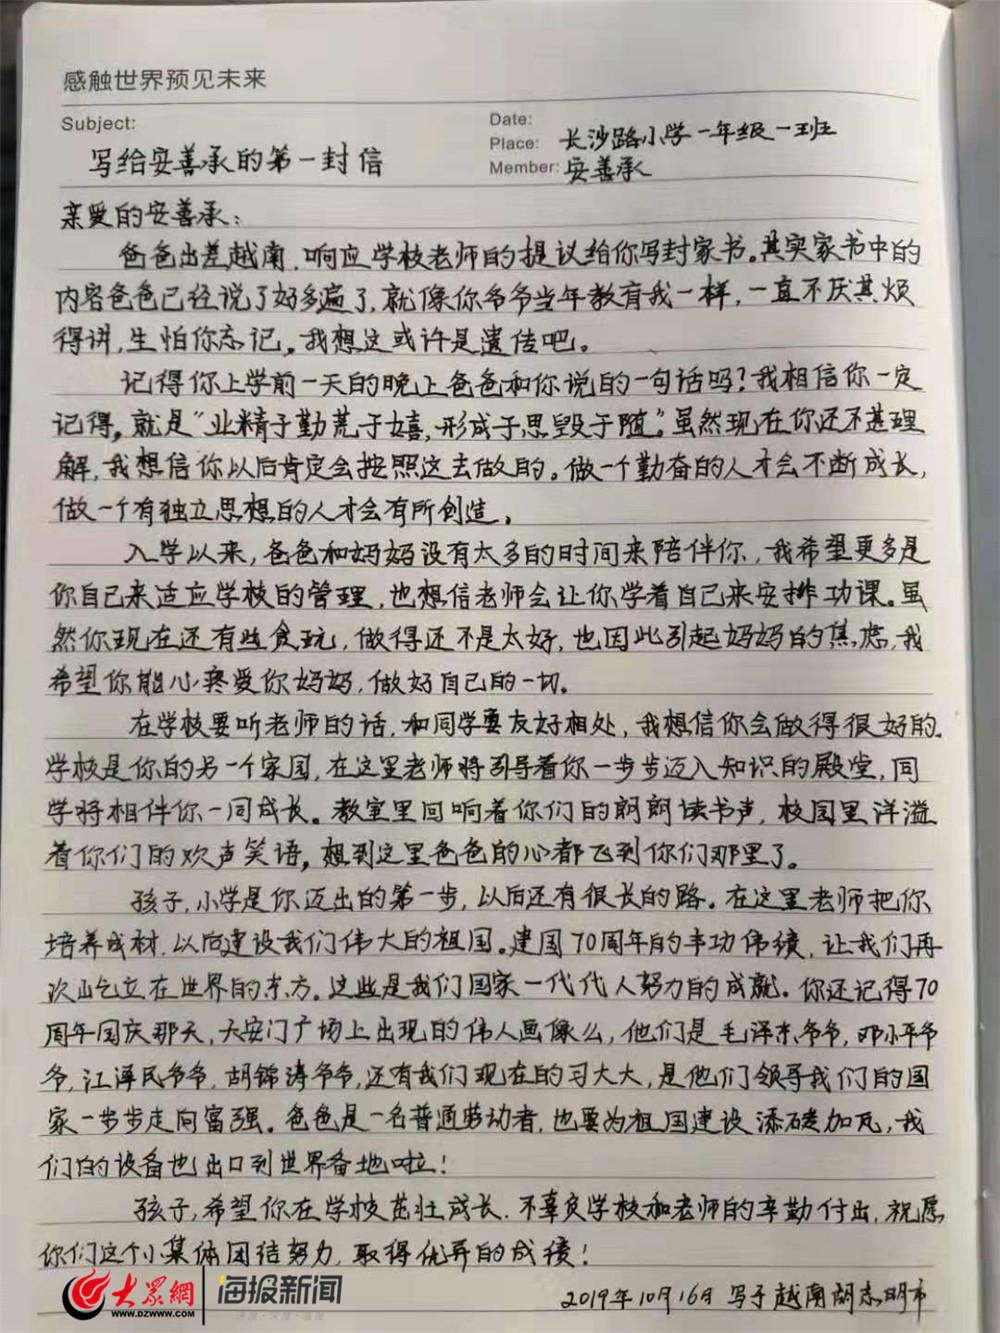 http://awantari.com/kejizhishi/70741.html